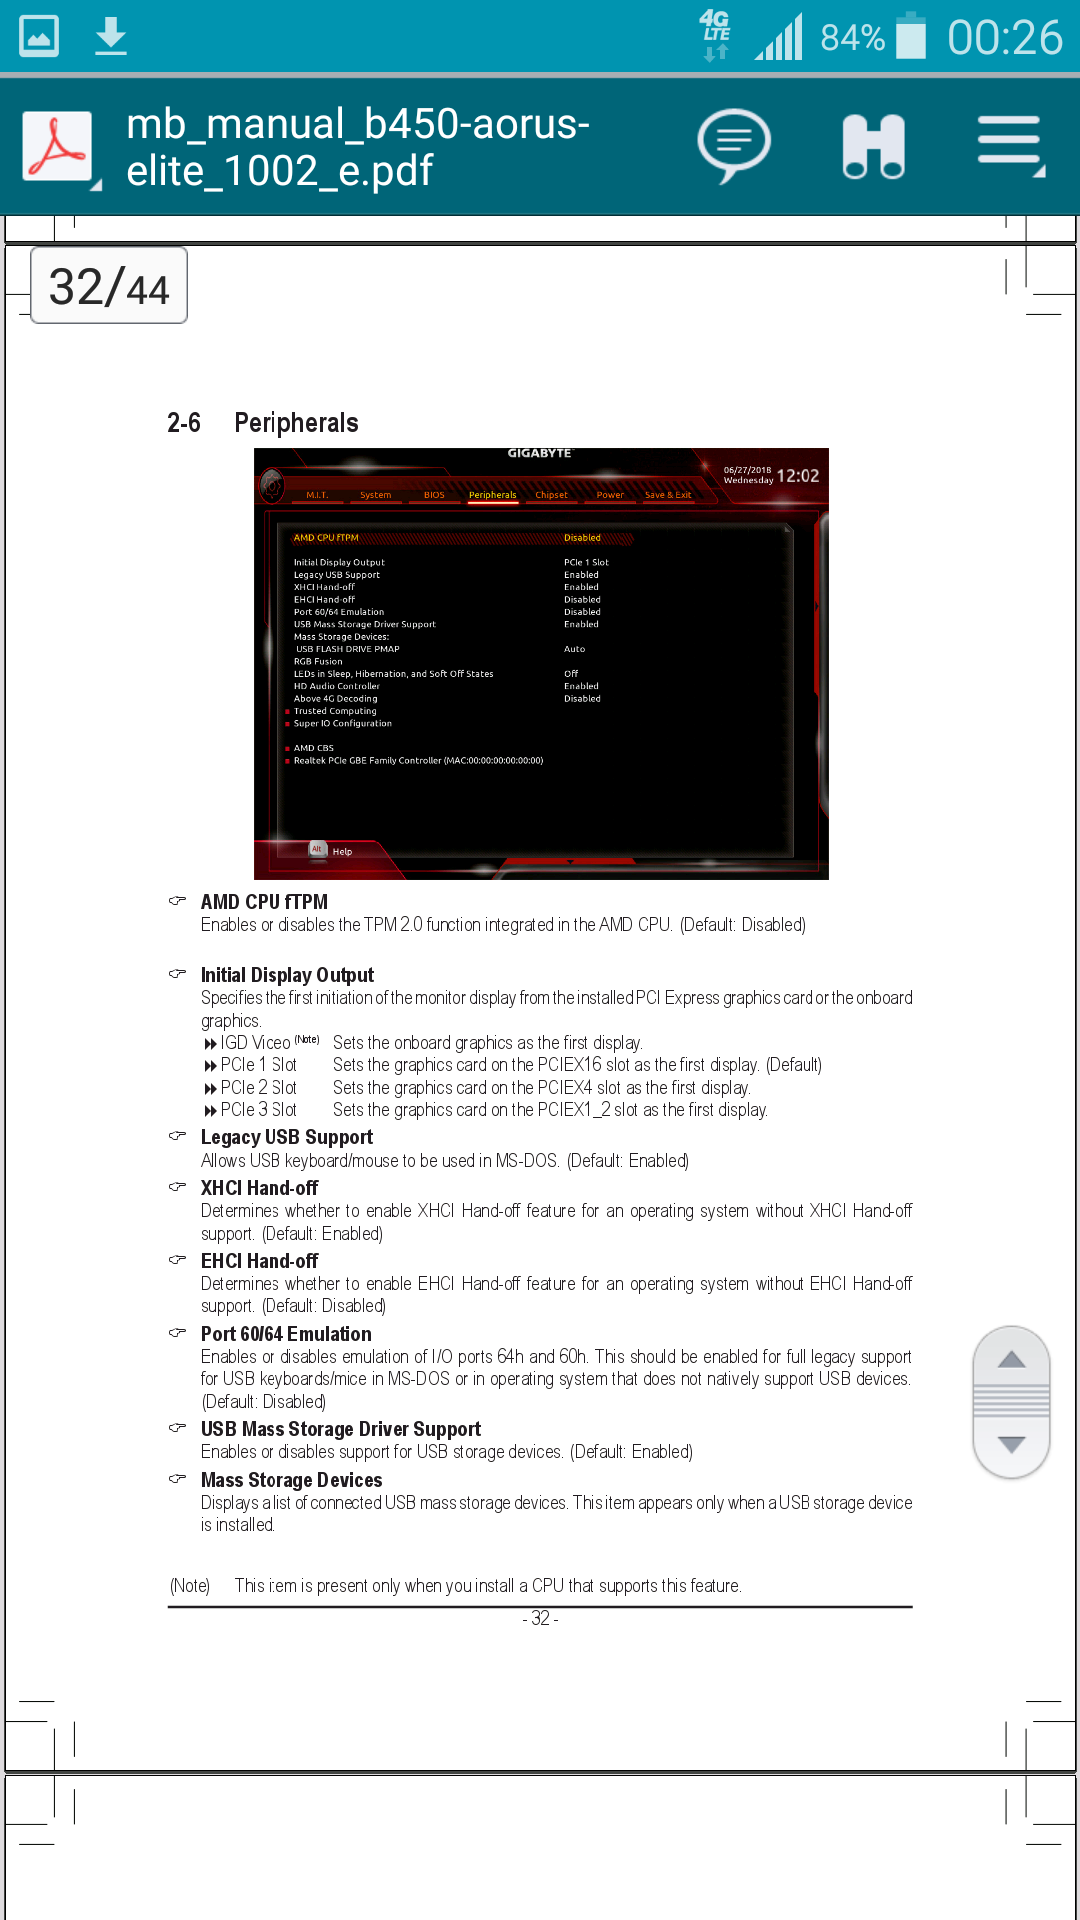 Screenshot_2020-02-17-00-26-00.png